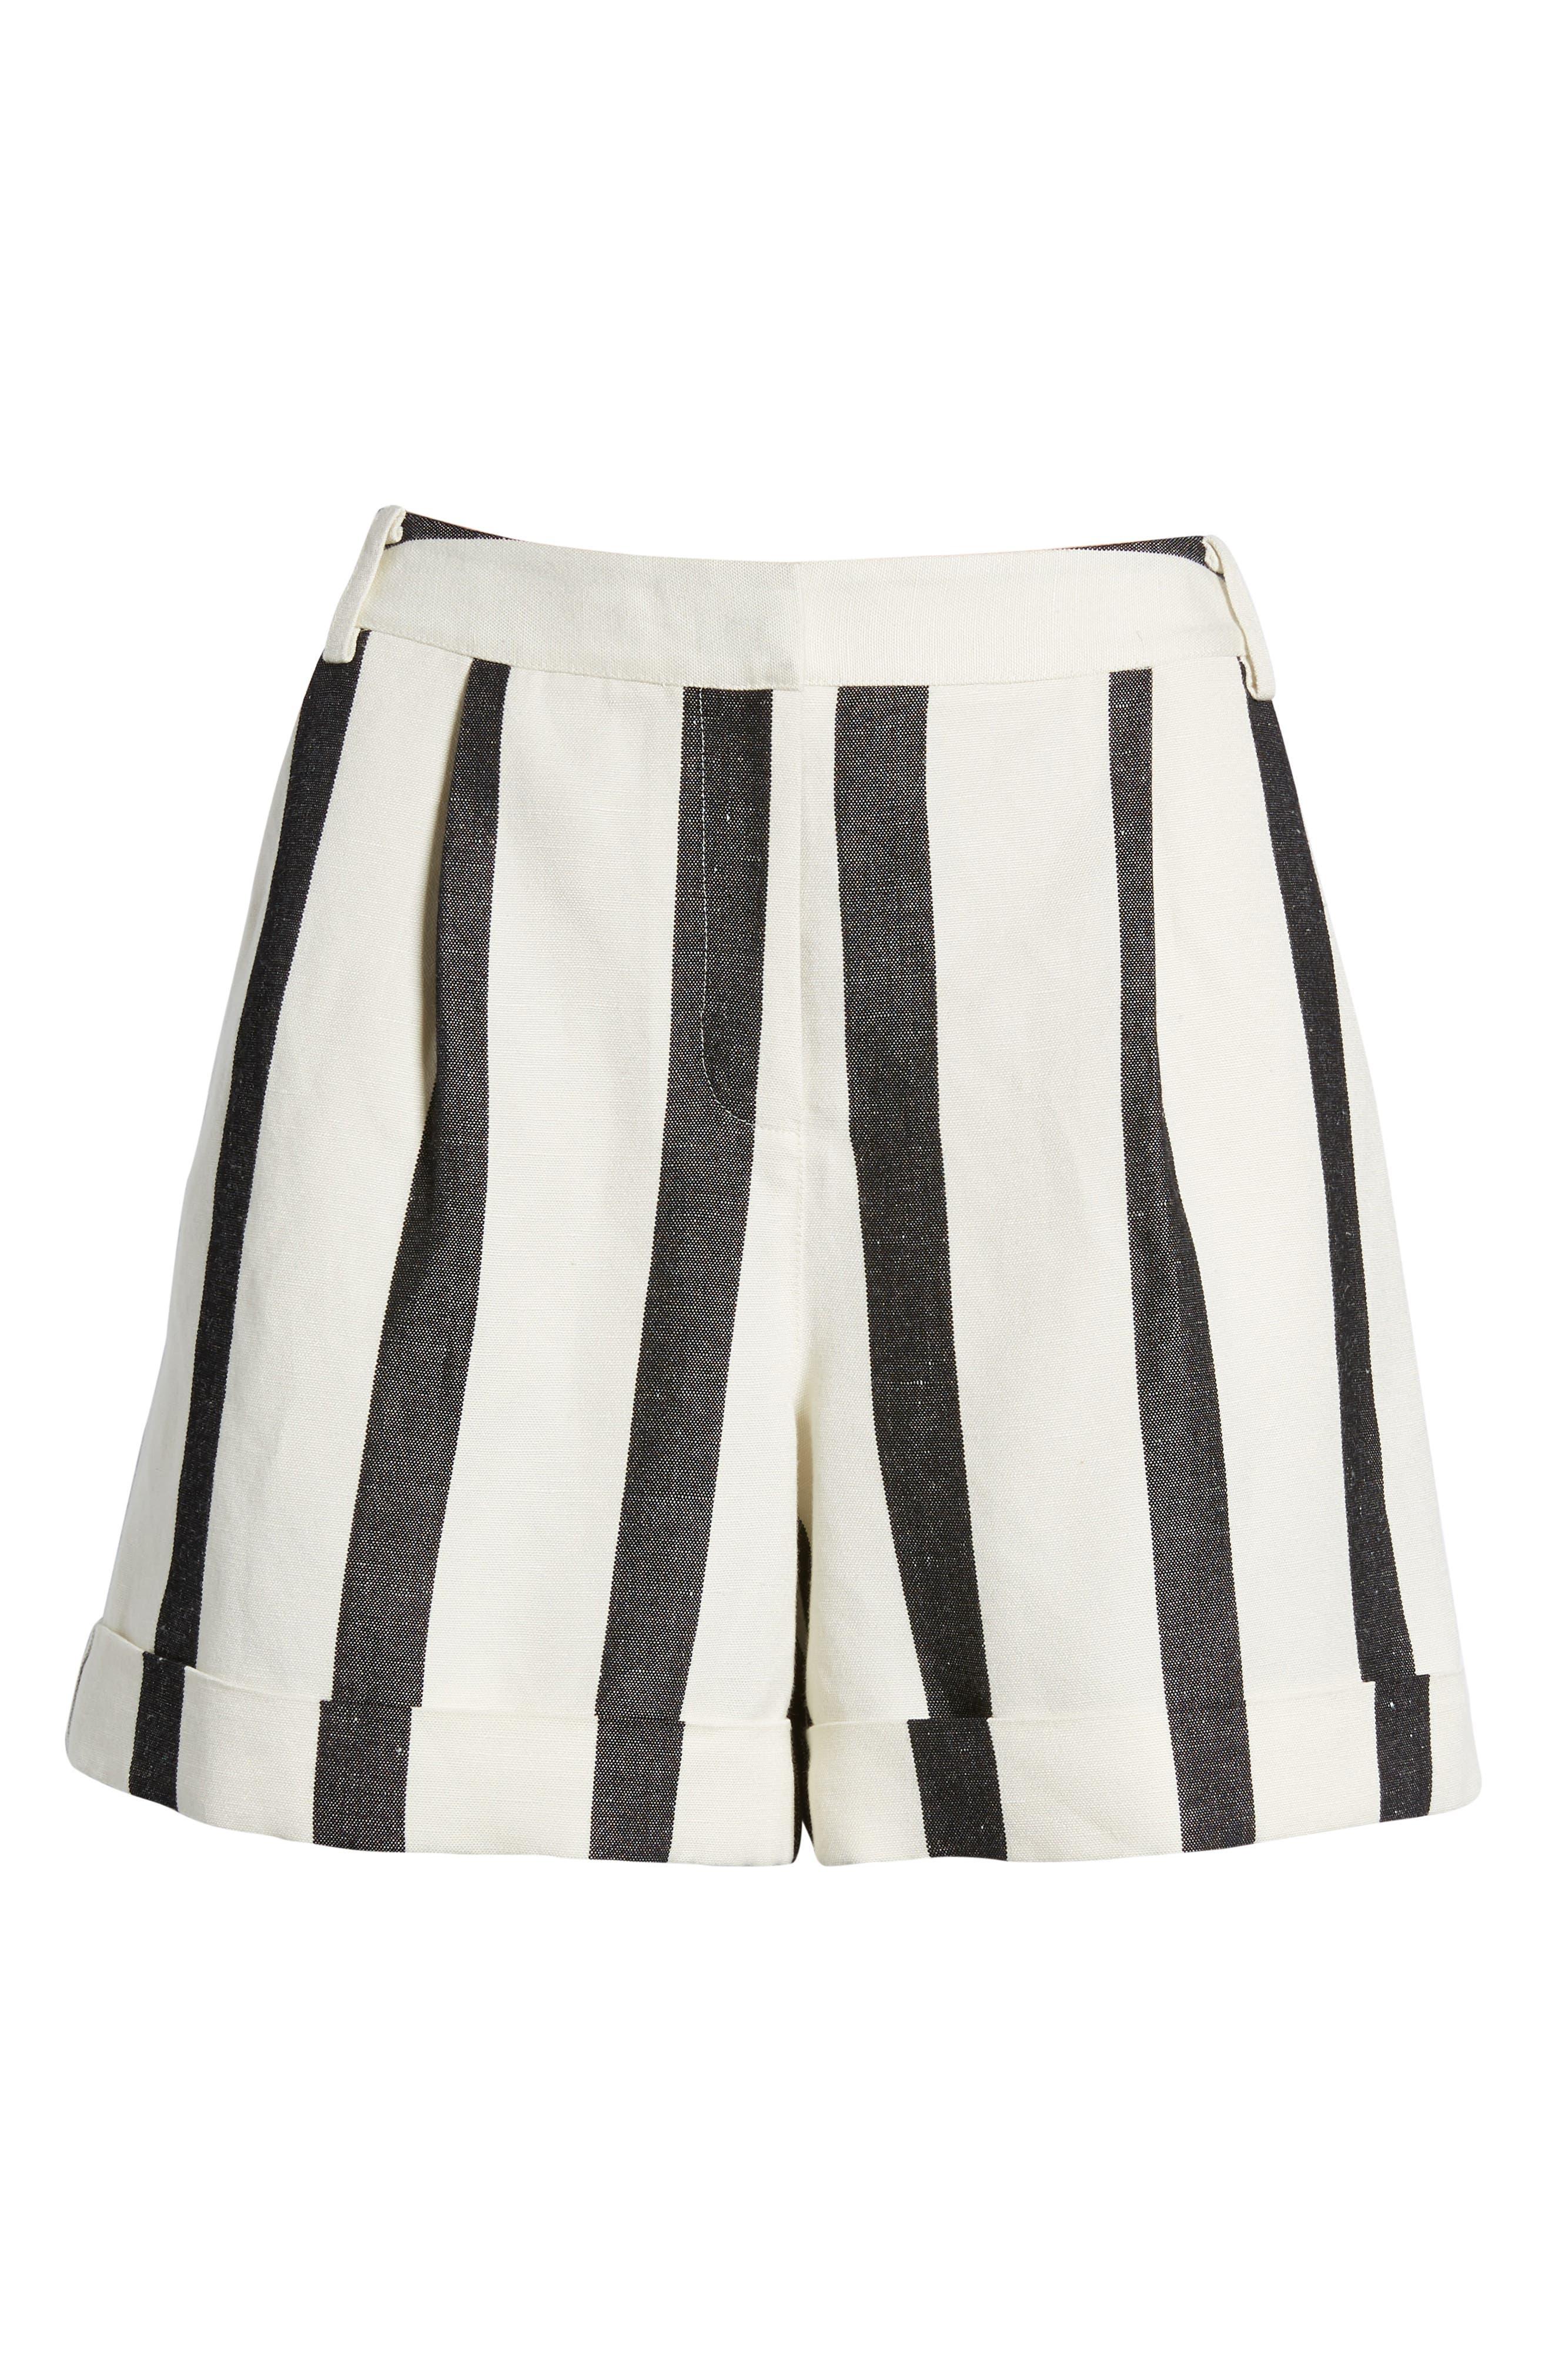 Stripe Cuff Shorts,                             Alternate thumbnail 6, color,                             Black- Ivory Bold Stripe